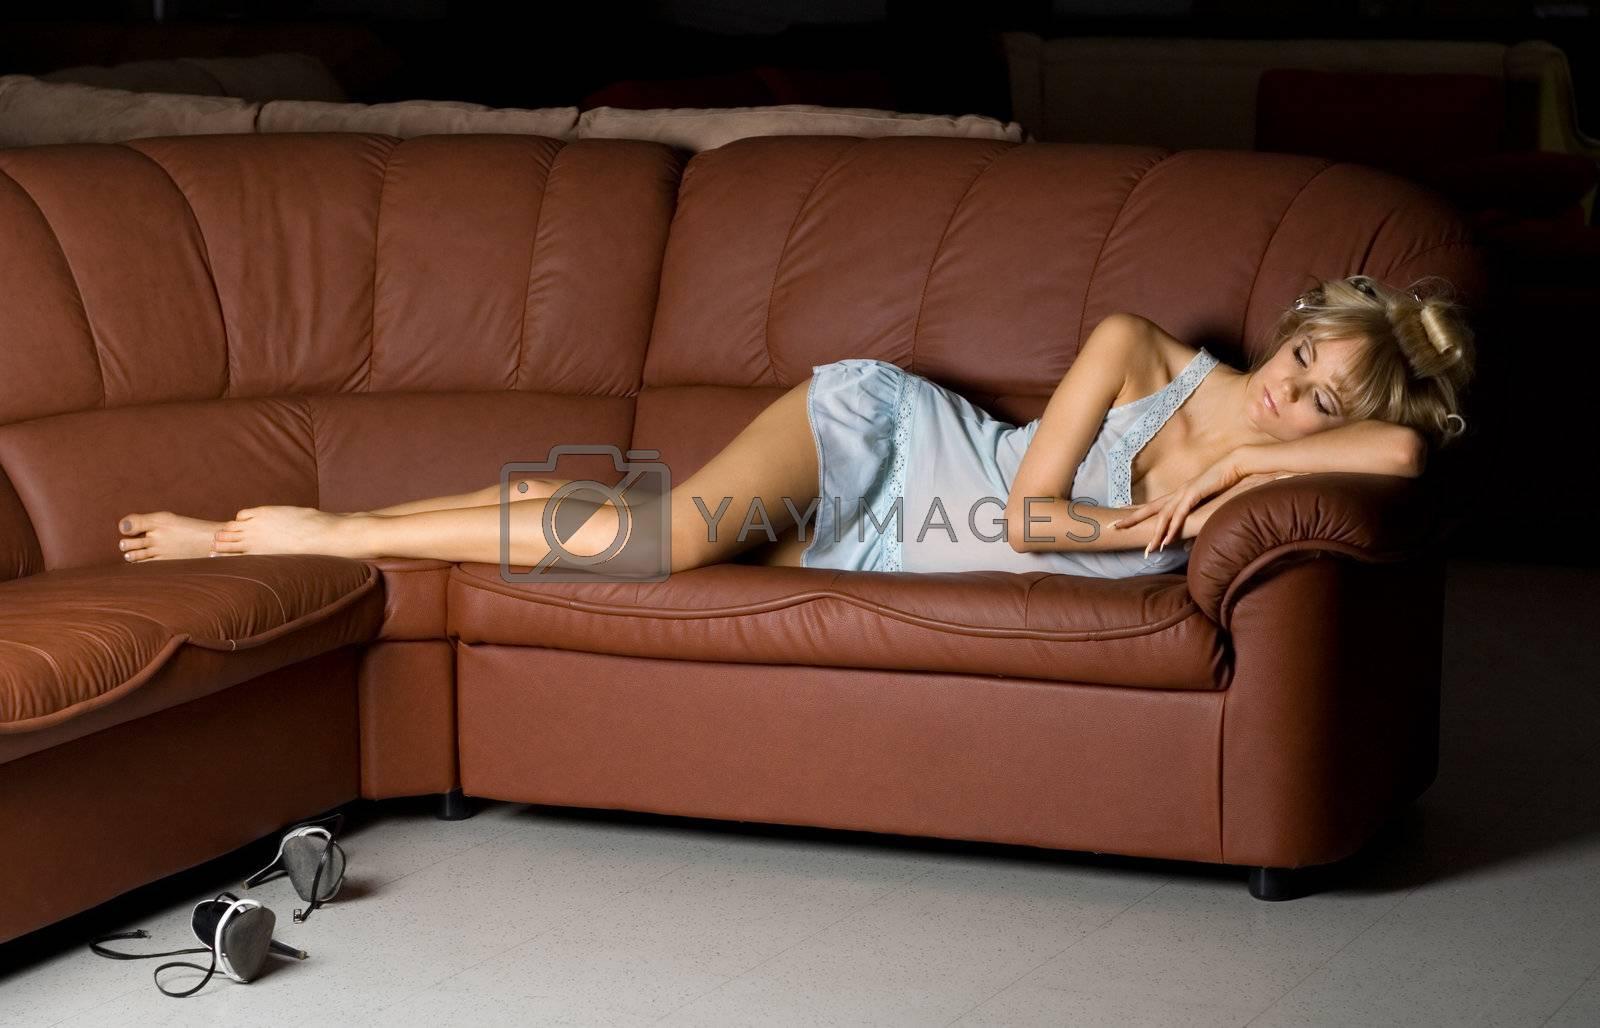 beautiful girl in blue lingerie sleeping on the sofa